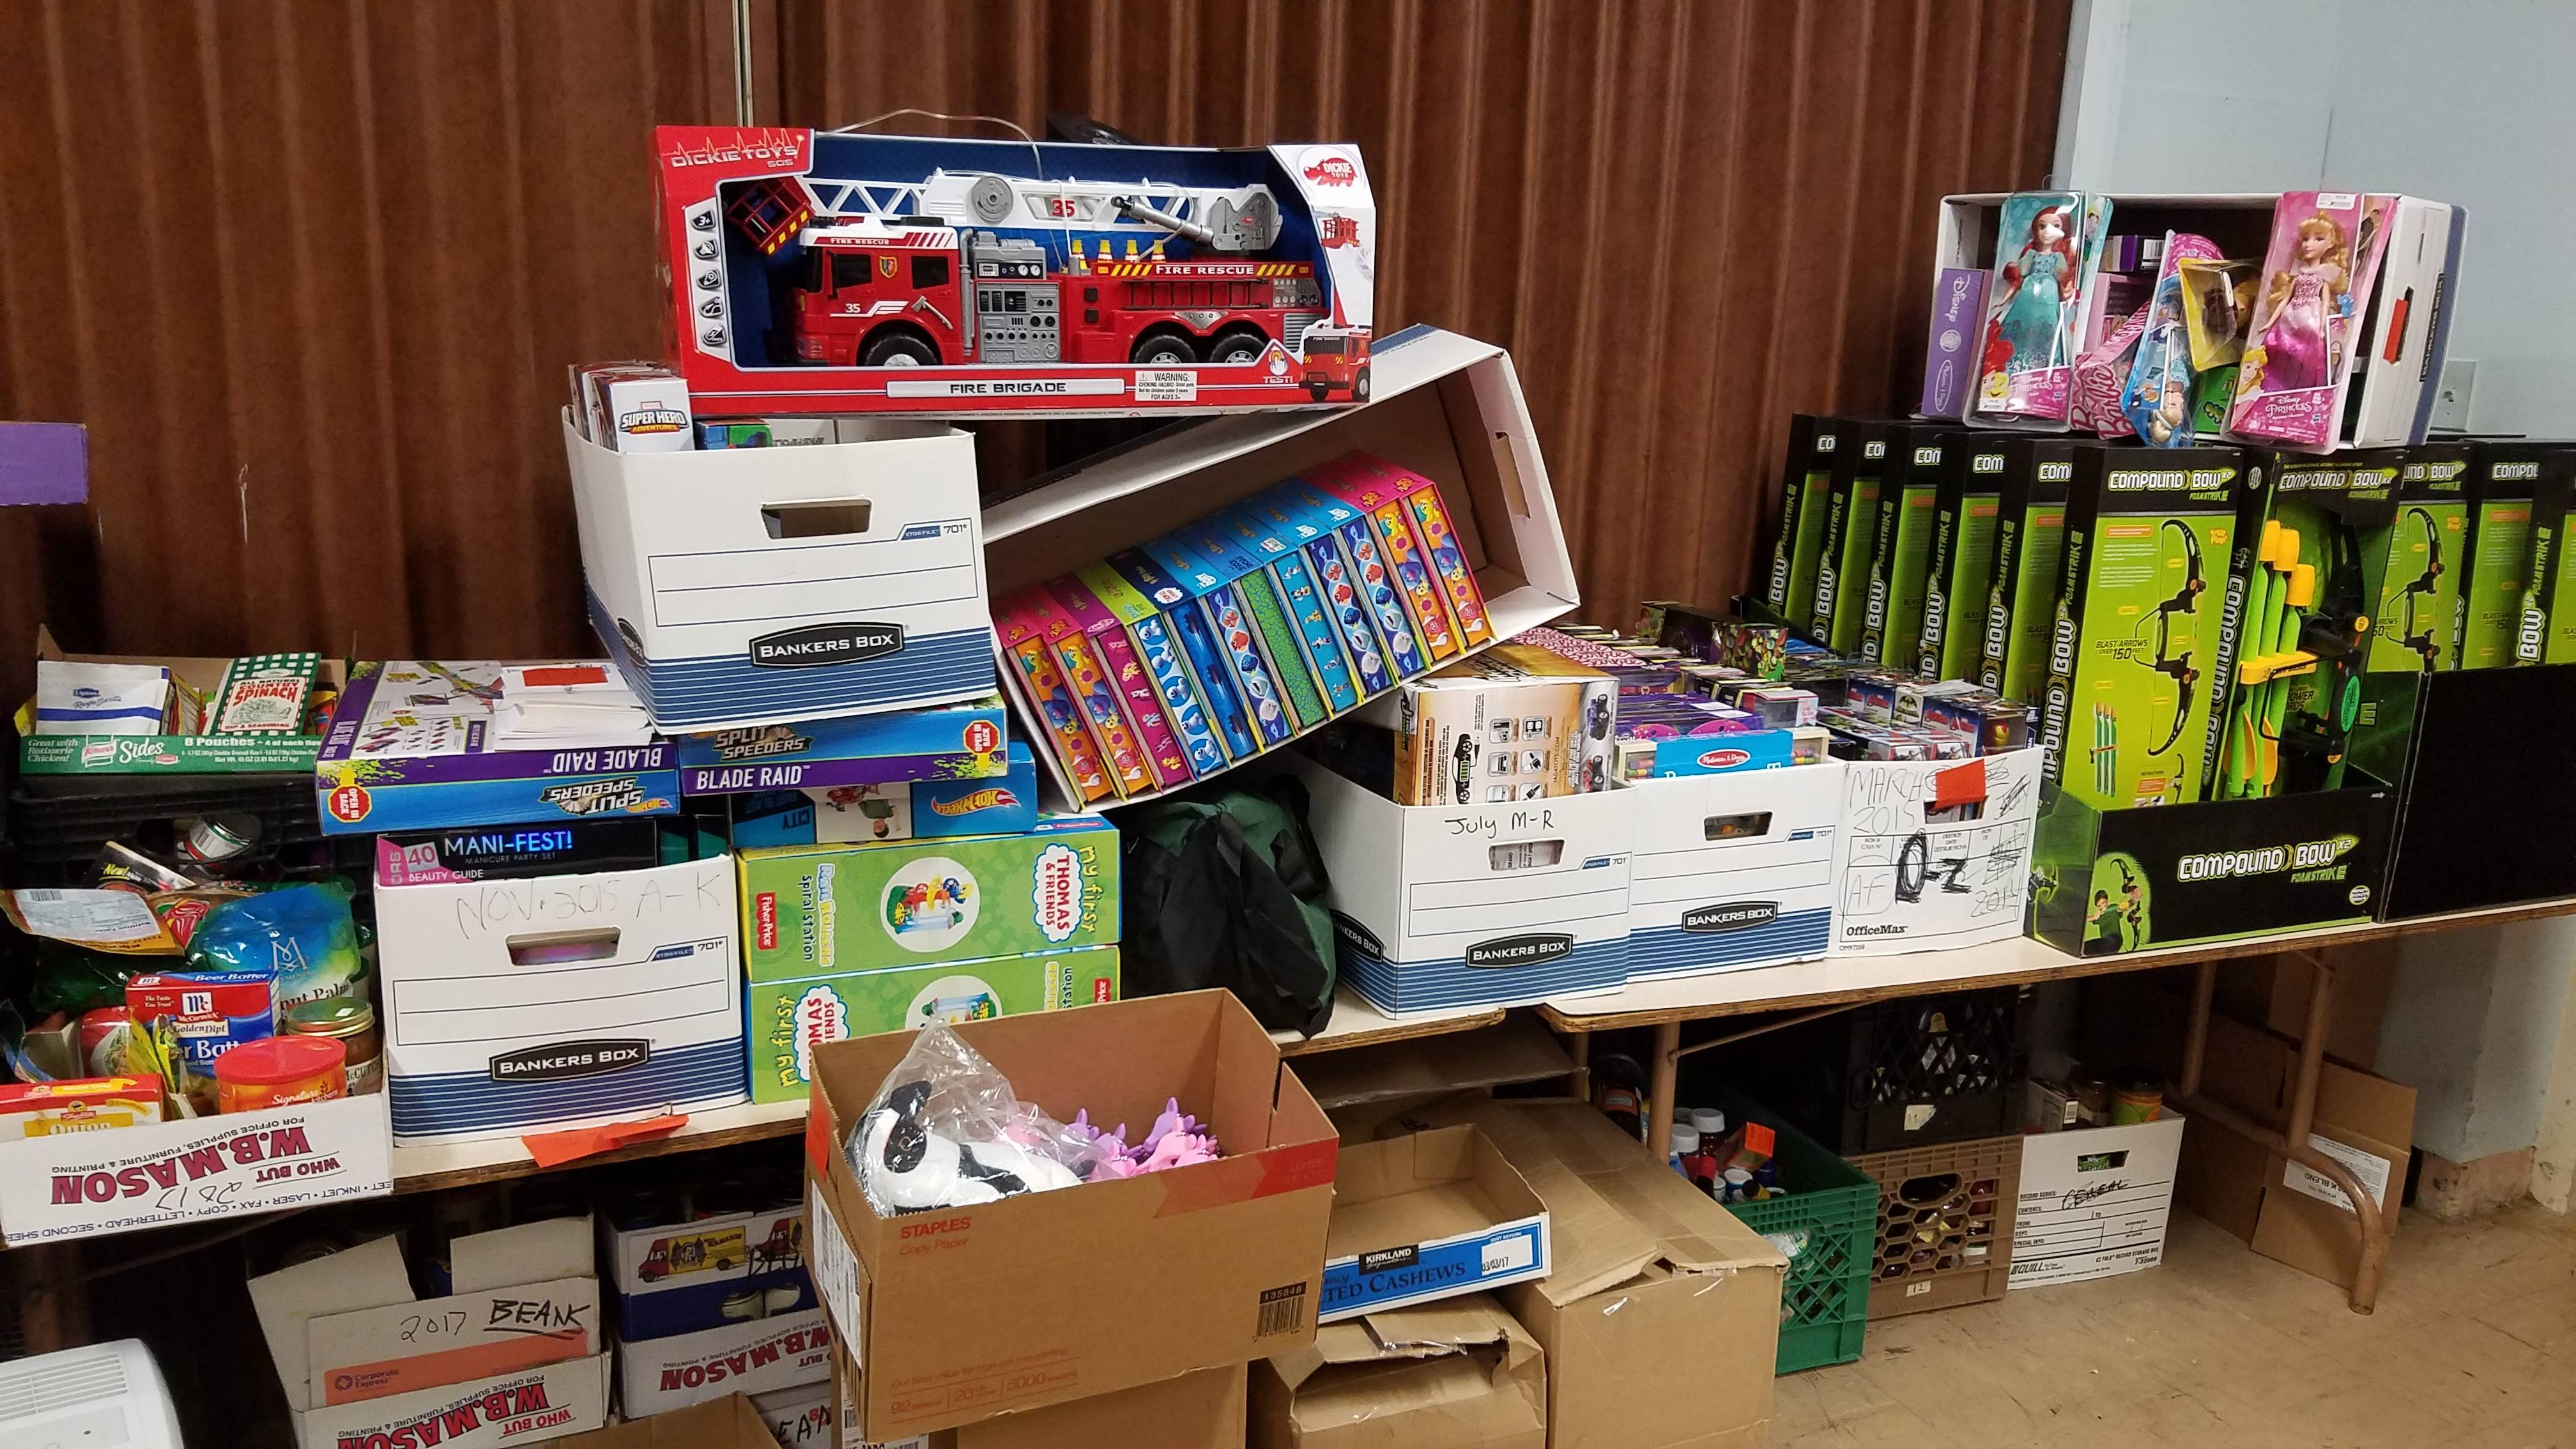 Vip honda donates toys for star fish food pantry holiday for Fish food pantry